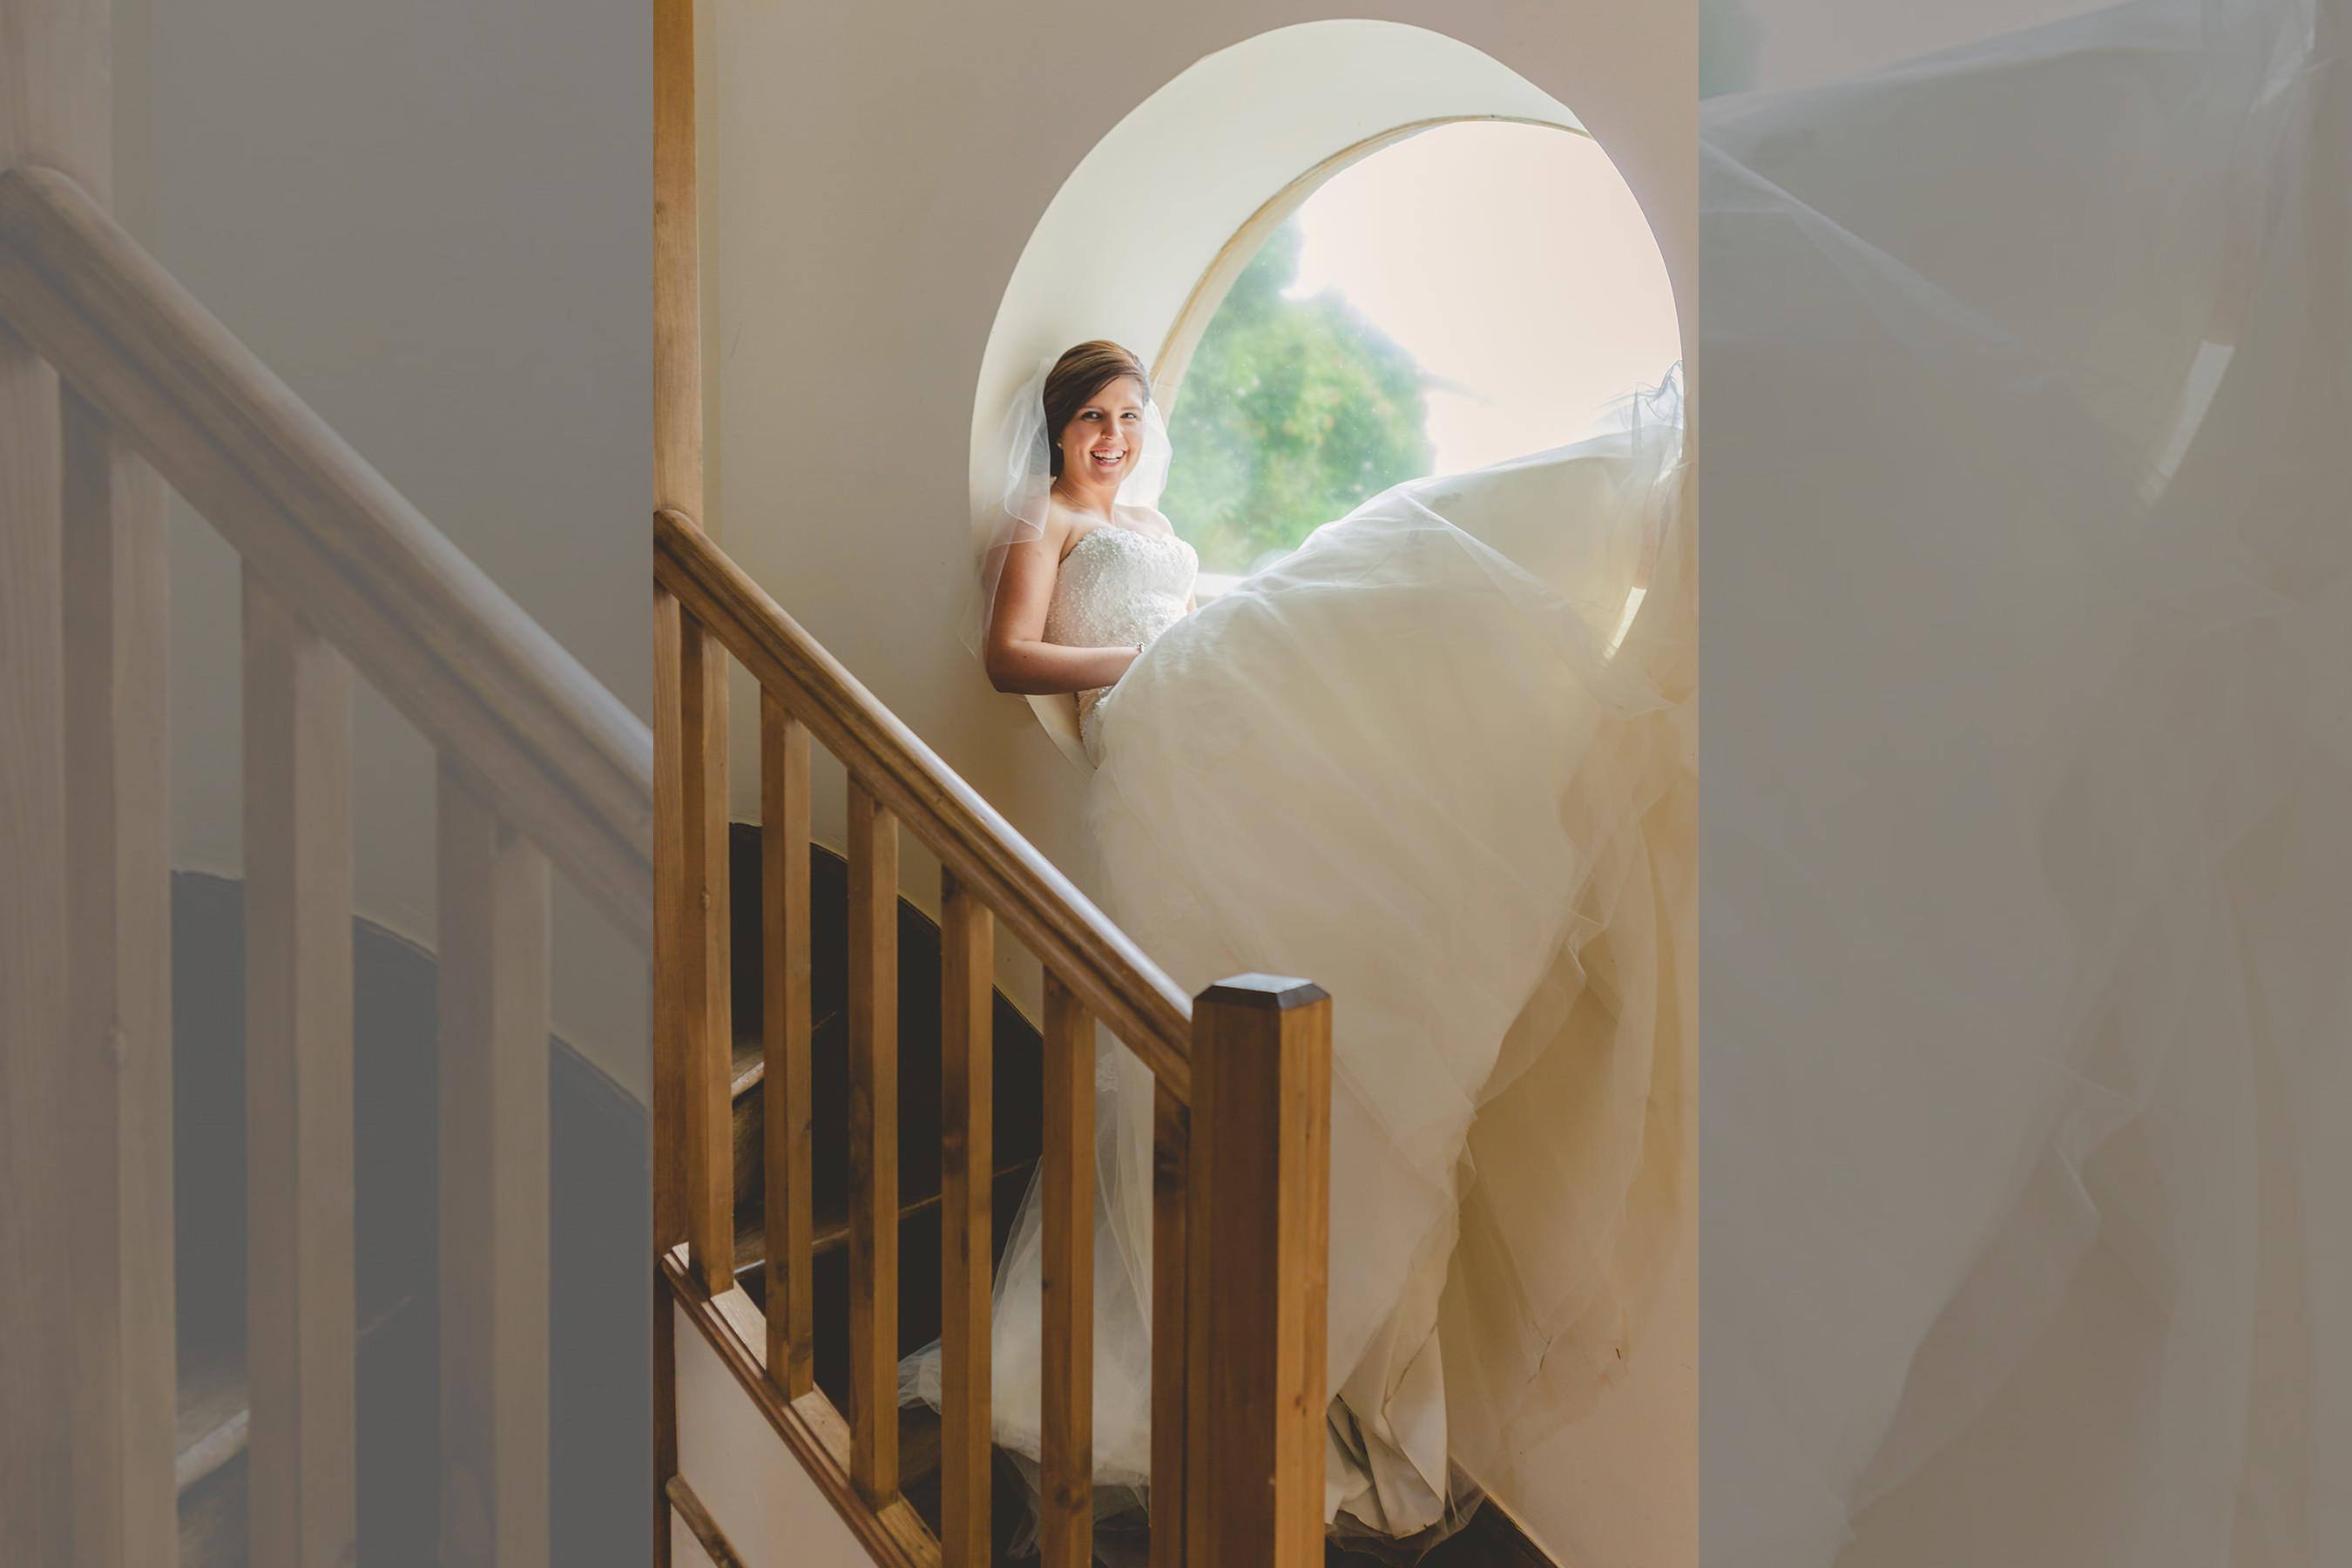 Wales | Powys | Glangrwyney | Summer | Vintage | DIY | Purple | Country House | Real Wedding | Art By Design Photography #Bridebook #RealWedding #WeddingIdeas Bridebook.co.uk